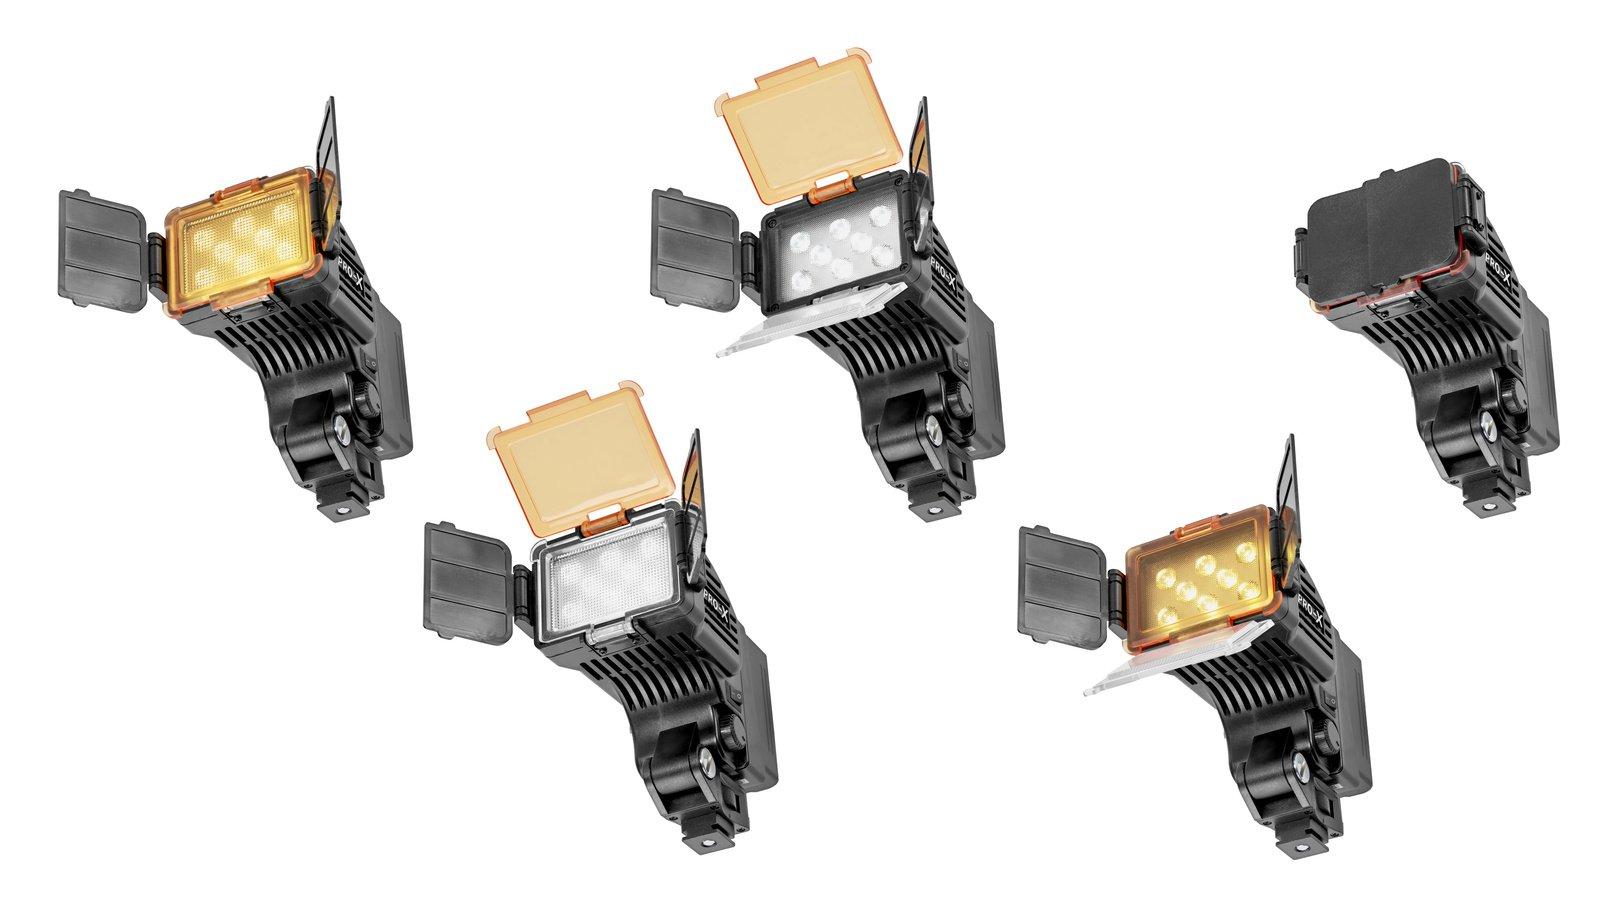 Pro-X COBRA S neigbare LED Kameraleuchte für Sony NP-F / D-Tap Foto Nr. 4